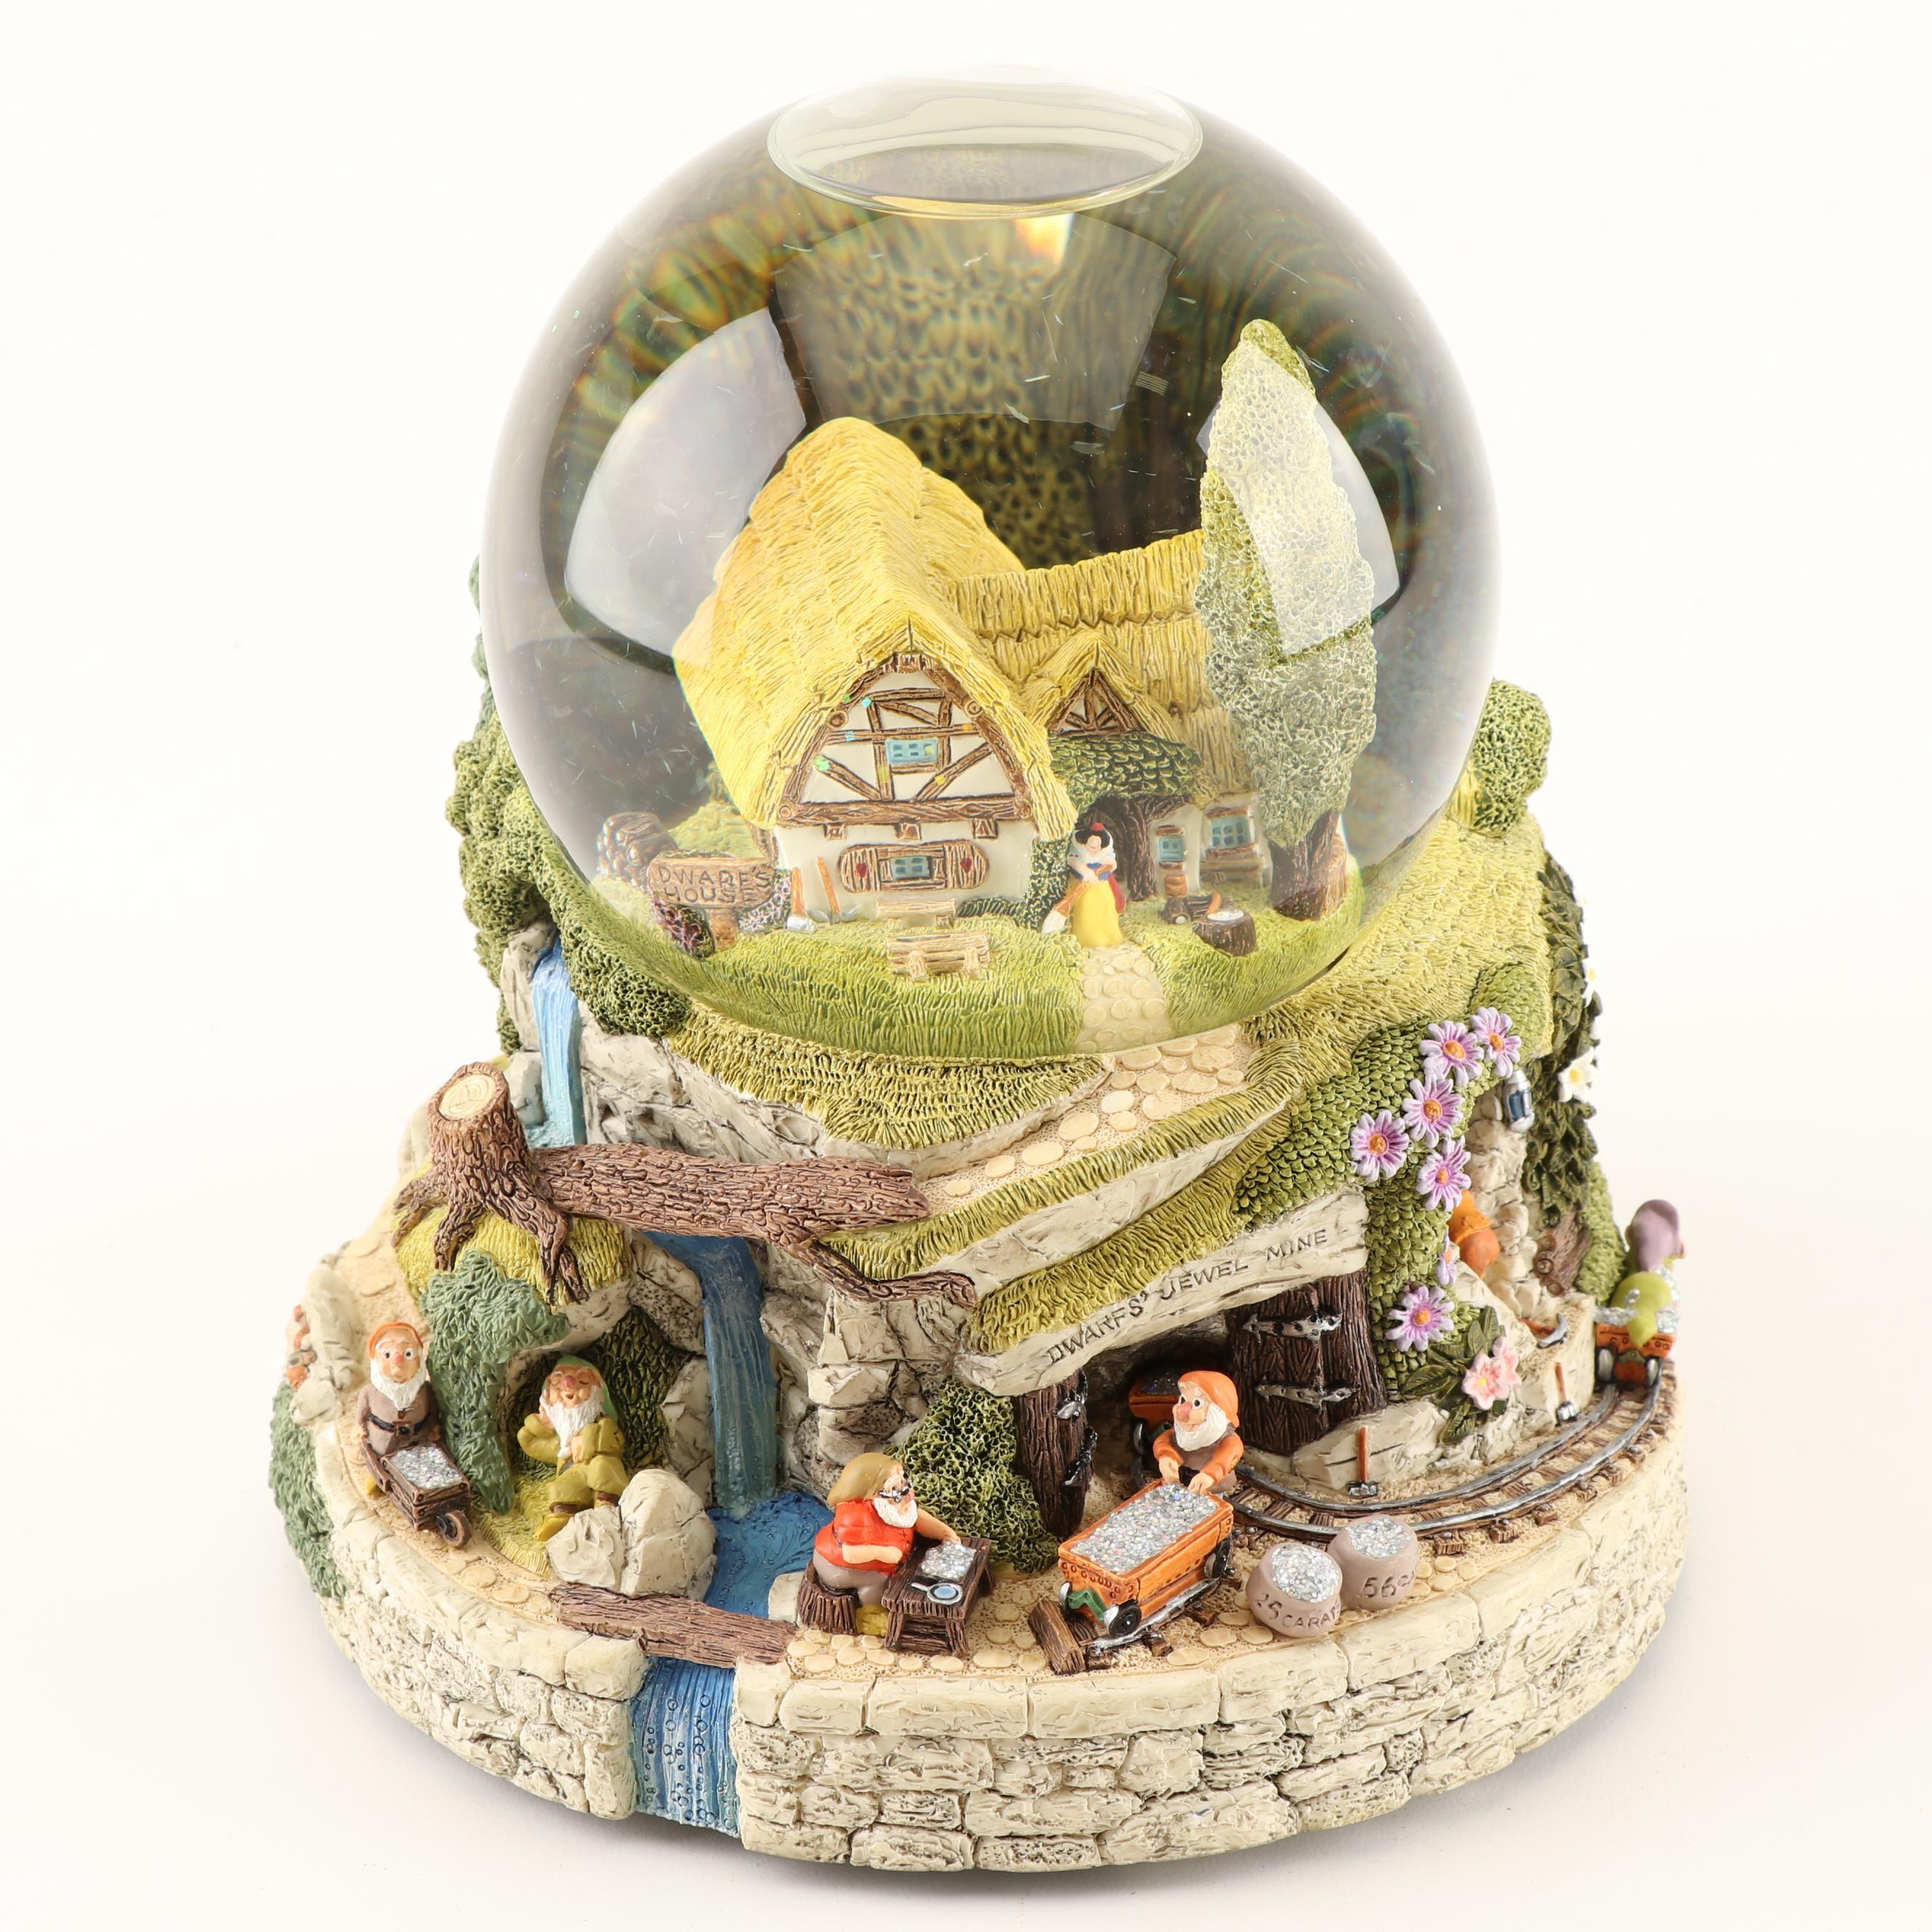 "Walt Disney's Snow White & The Seven Dwarfs Snow Globe ""Hi Ho Hi Ho"" Music Box"